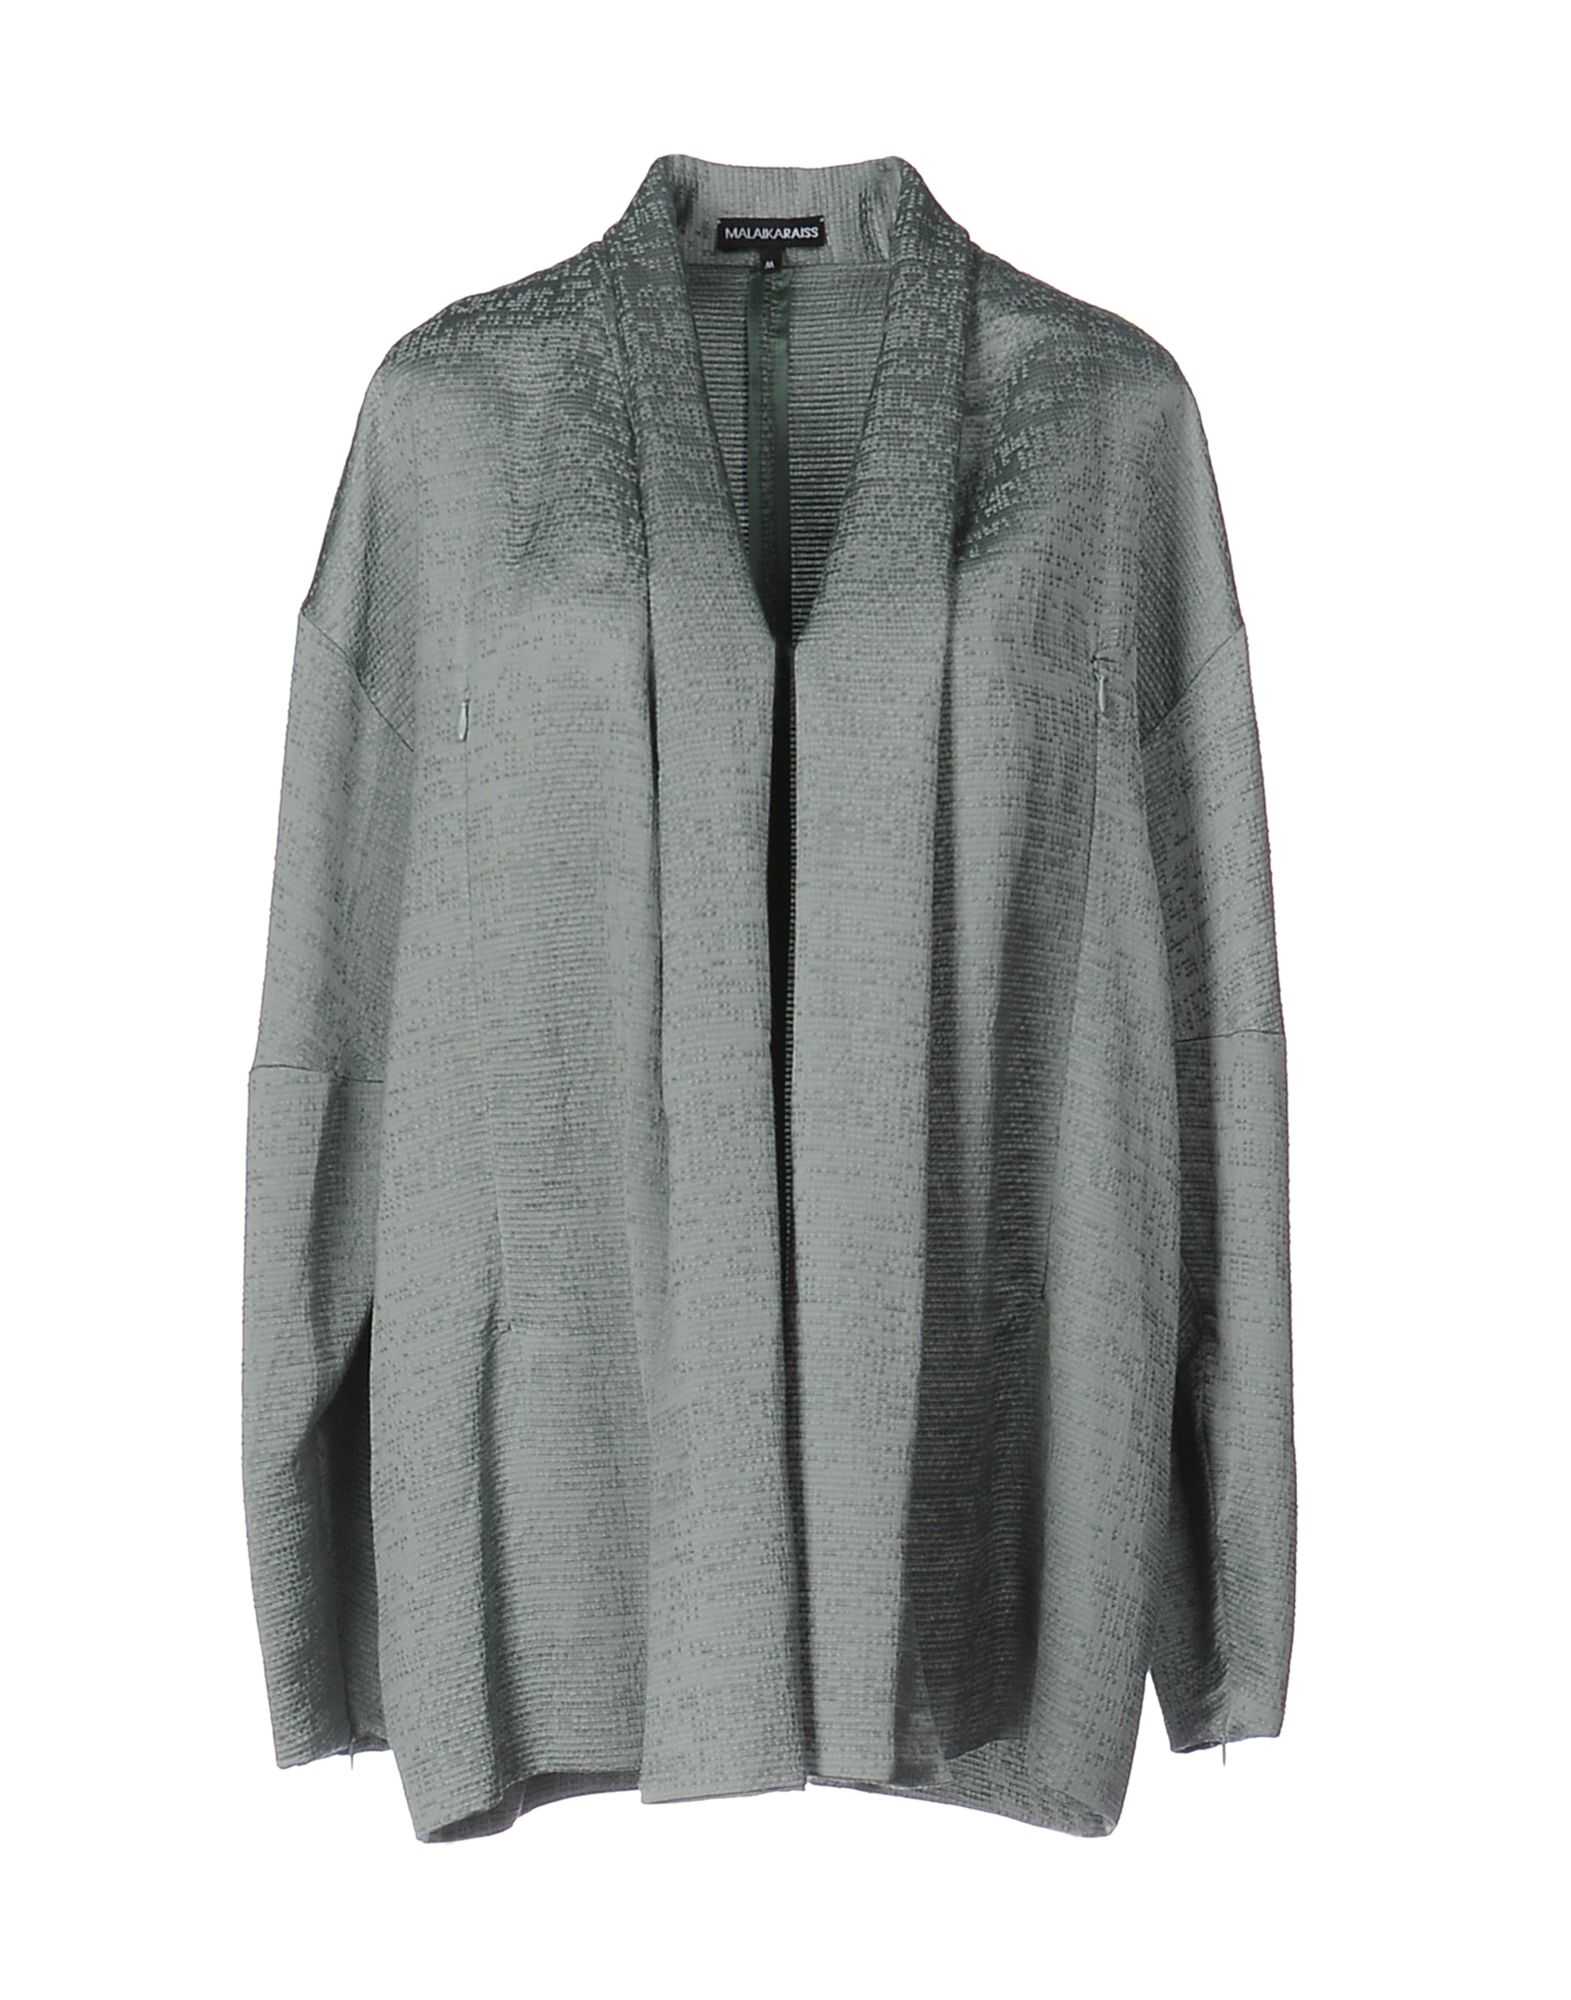 MALAIKA RAISS Damen Lange Jacke Farbe Säuregrün Größe 5 jetztbilligerkaufen